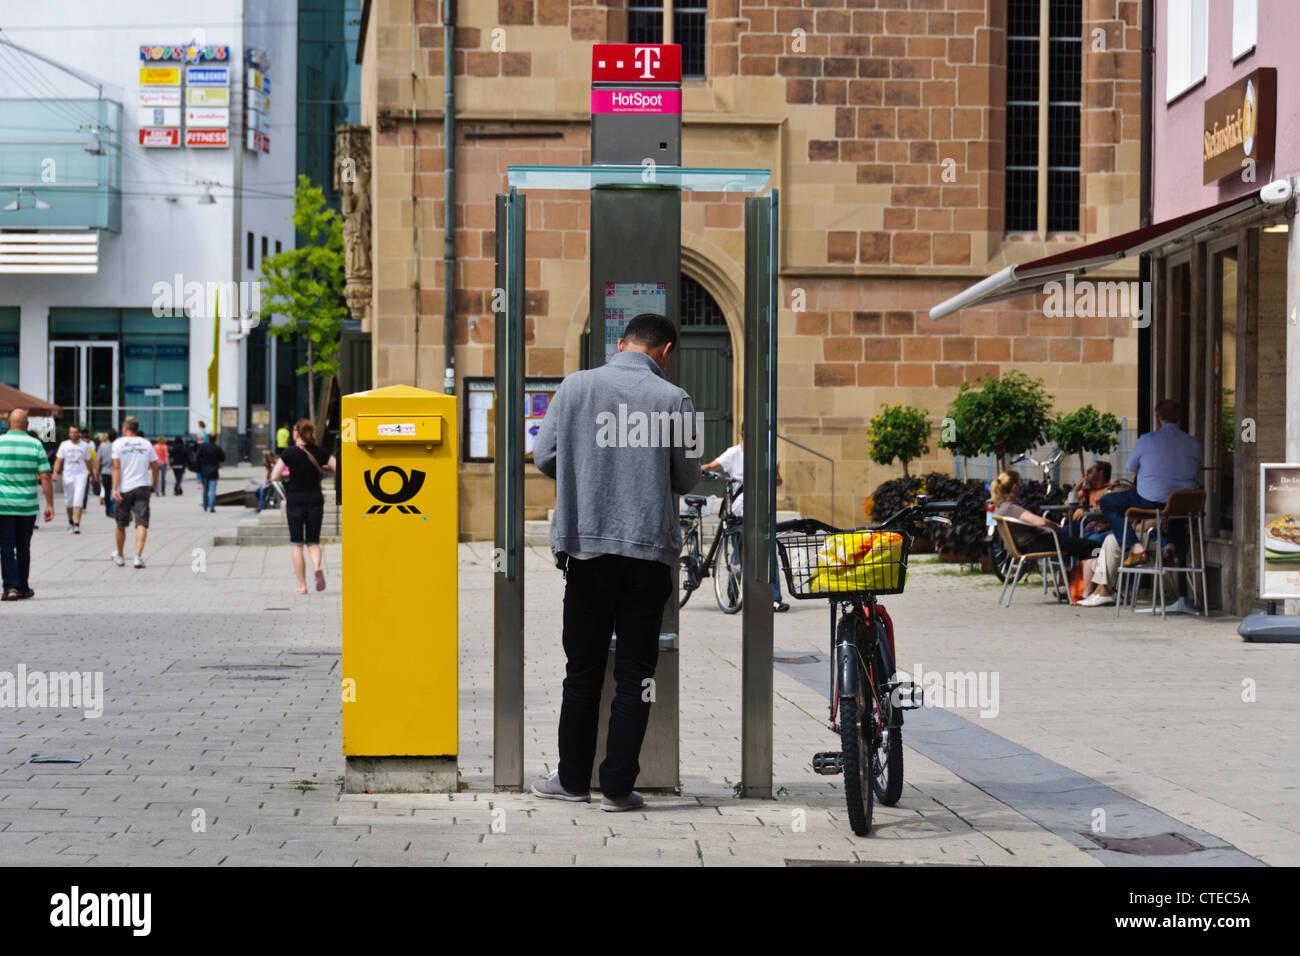 Man in public telephone booth Deutsche Post letterbox